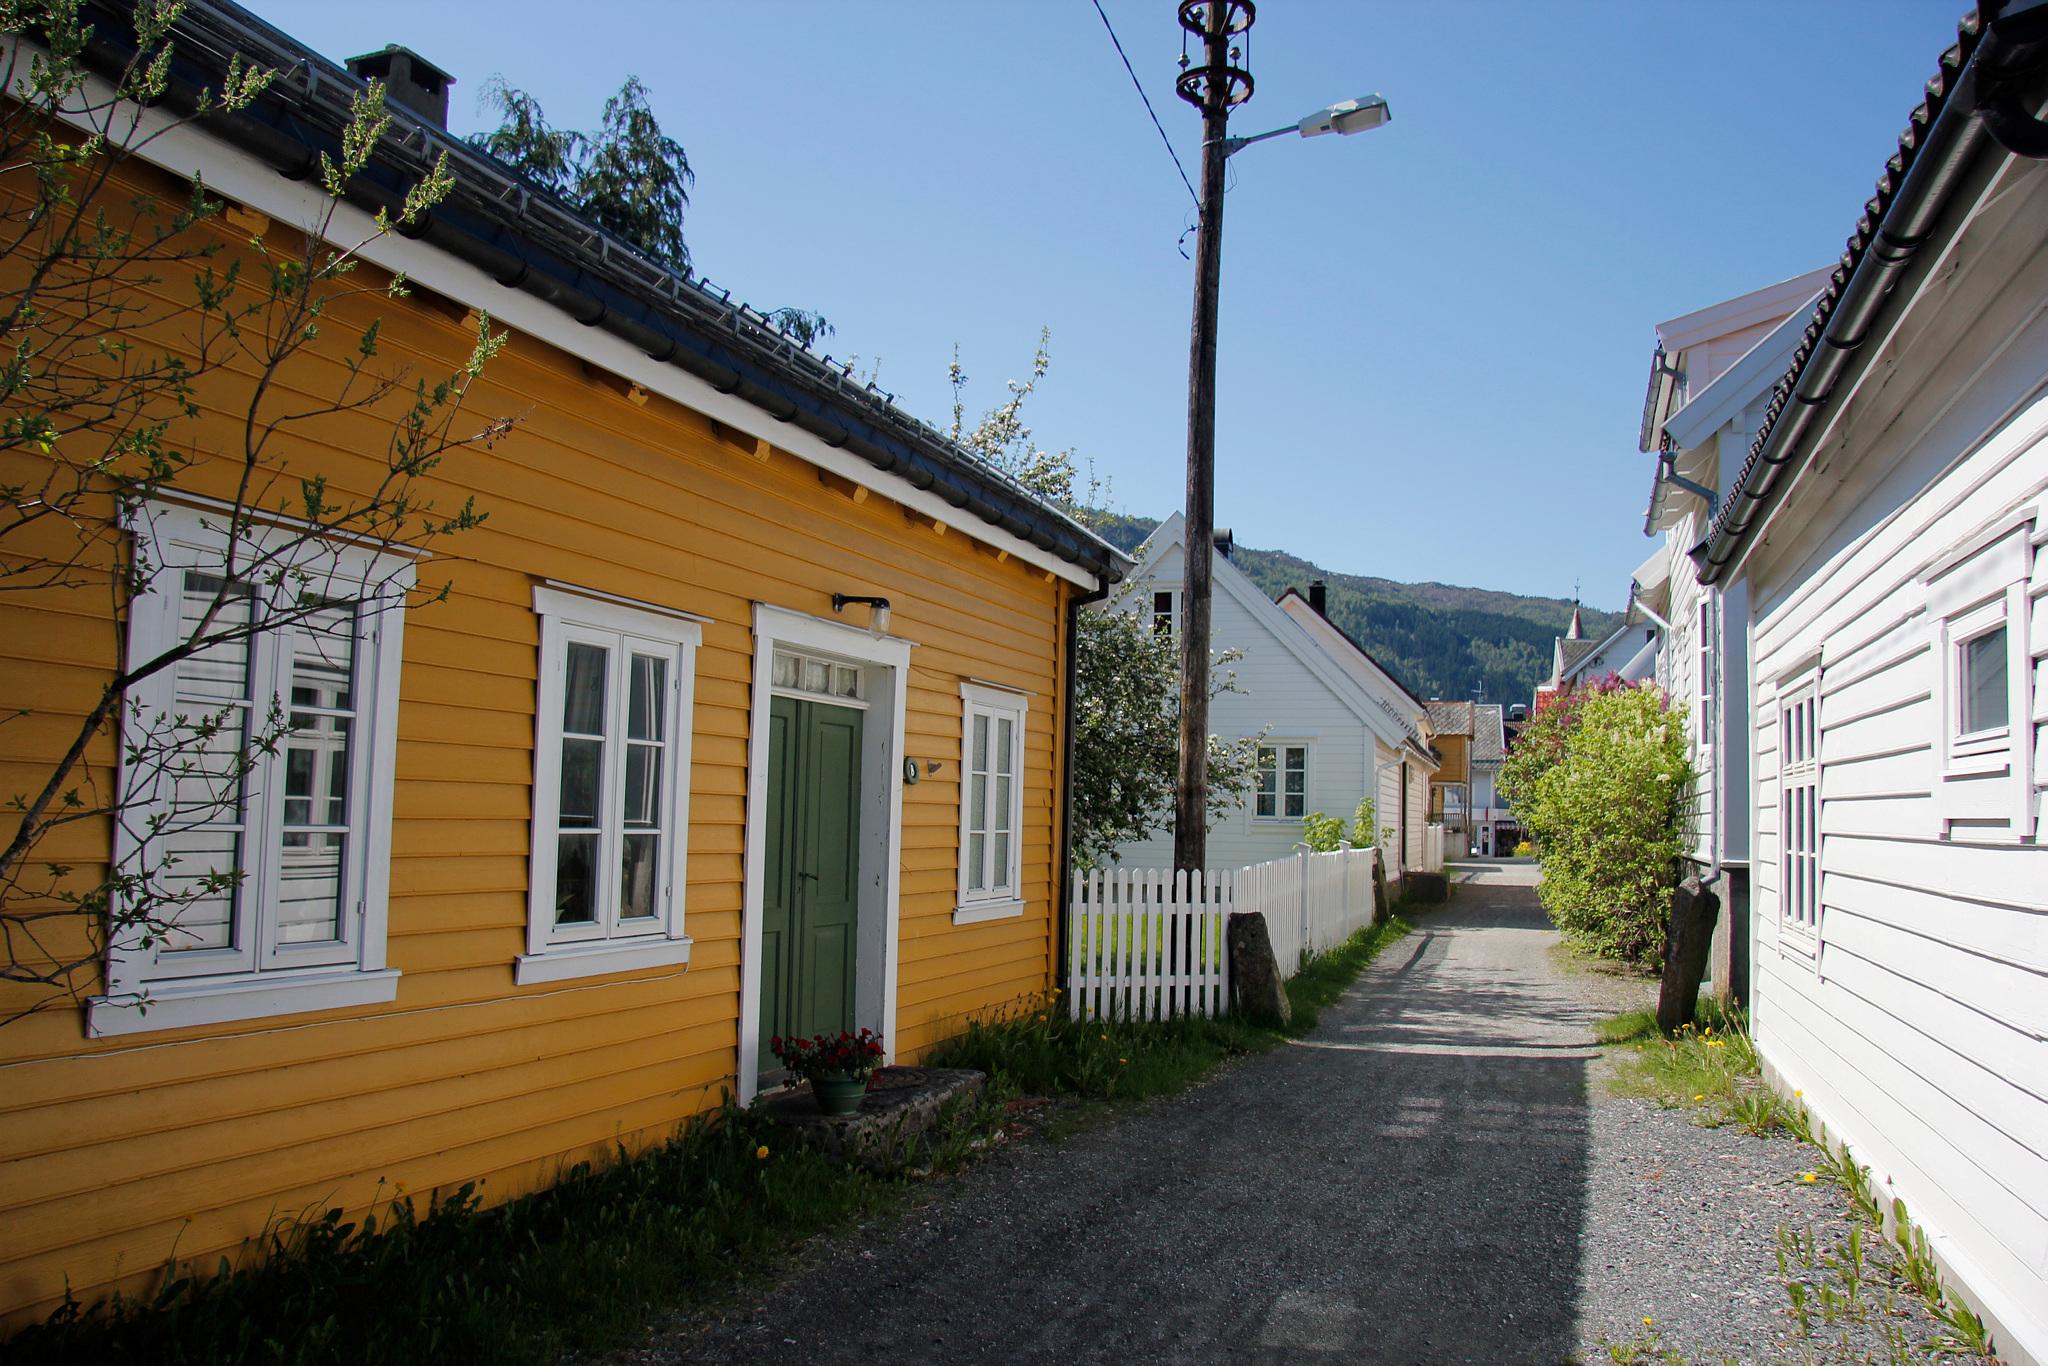 Bildet viser Tverrgata, Nordfjordeid. Foto: Anders Sellevold Aaseth, Riksantikvaren